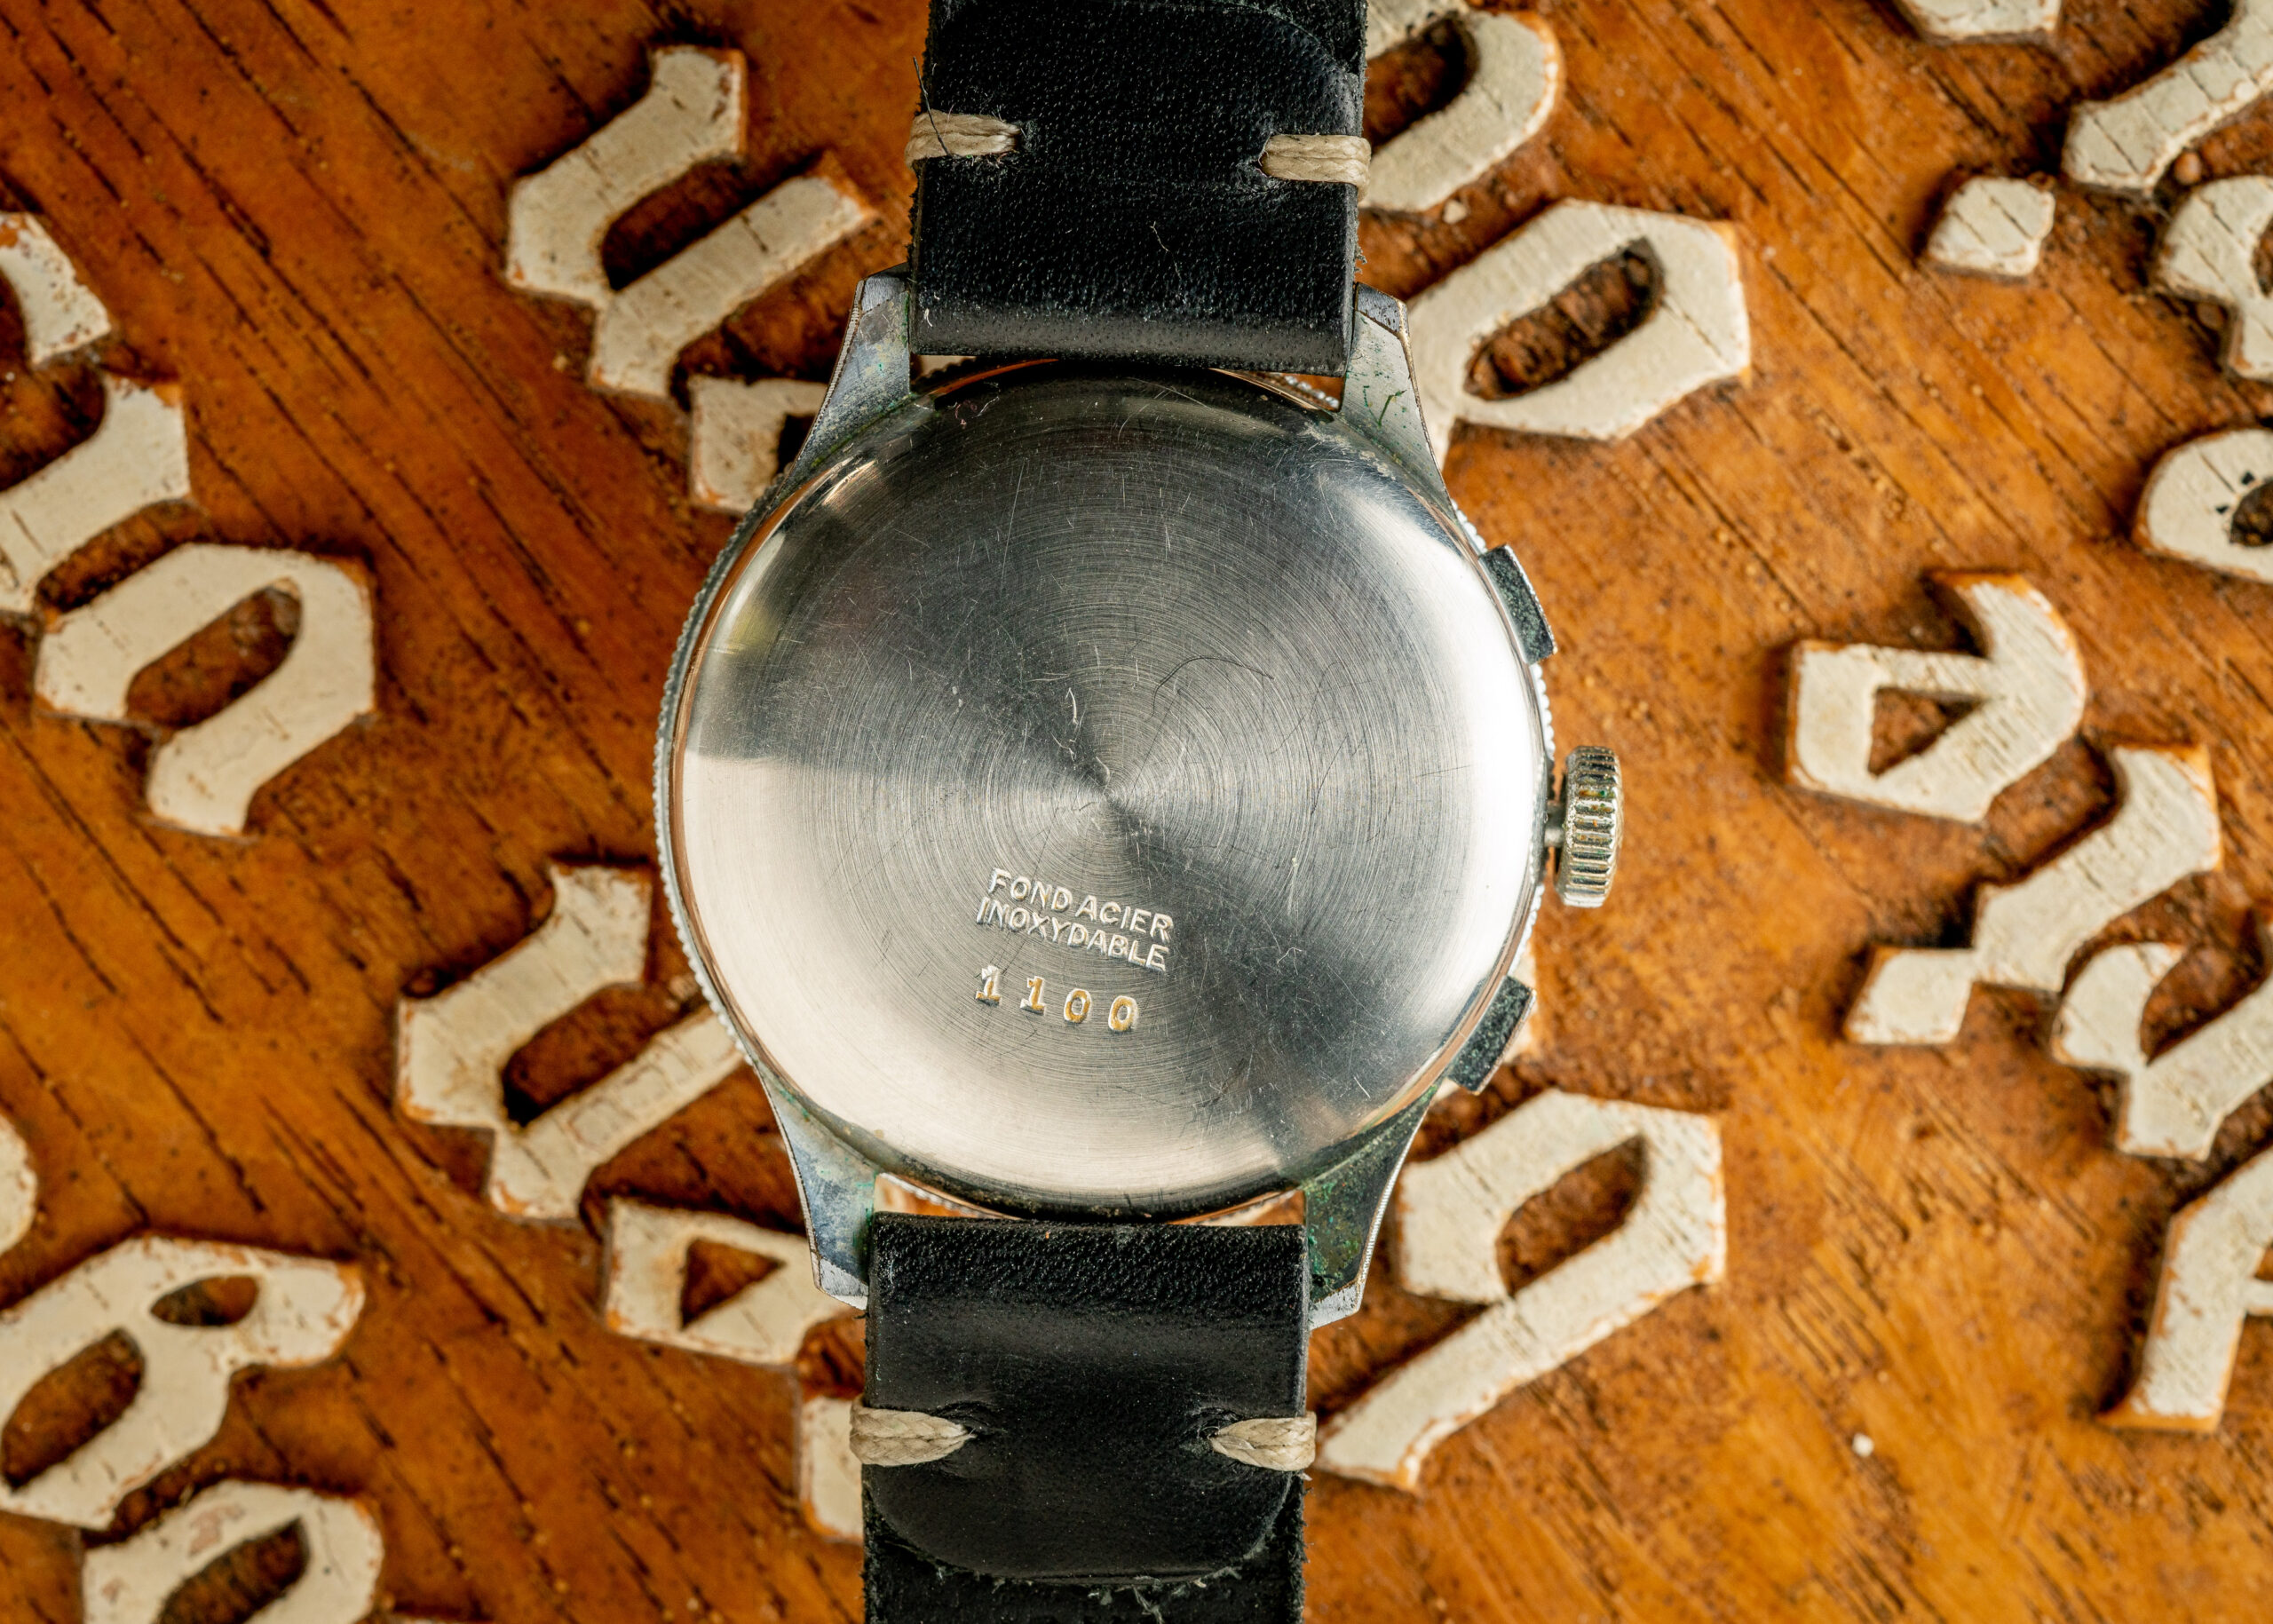 Vintage Butex Chronograph Triple Calendar watch caseback